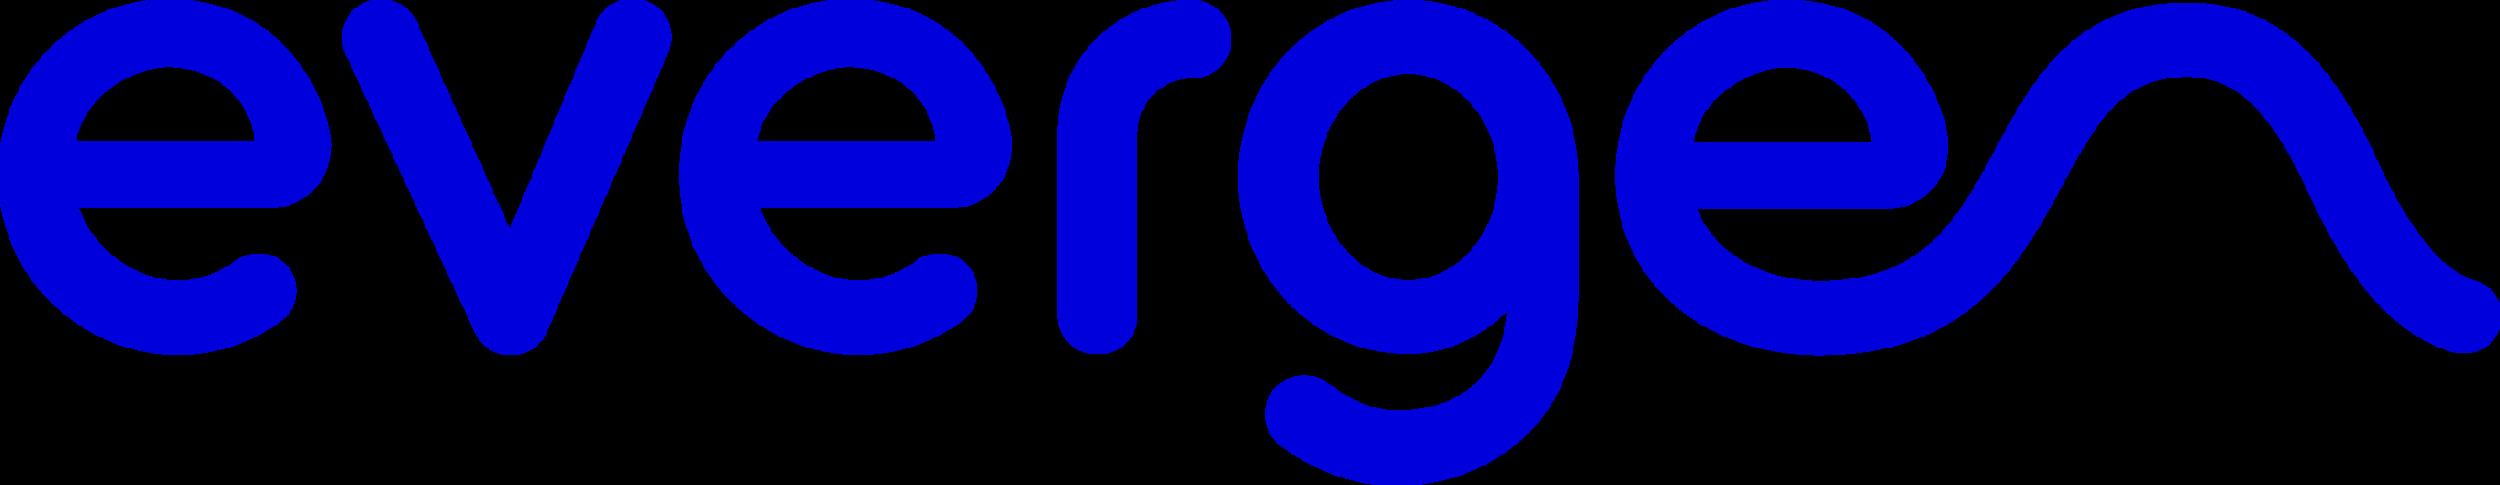 Evergen_Logo_Blue_RGB.png